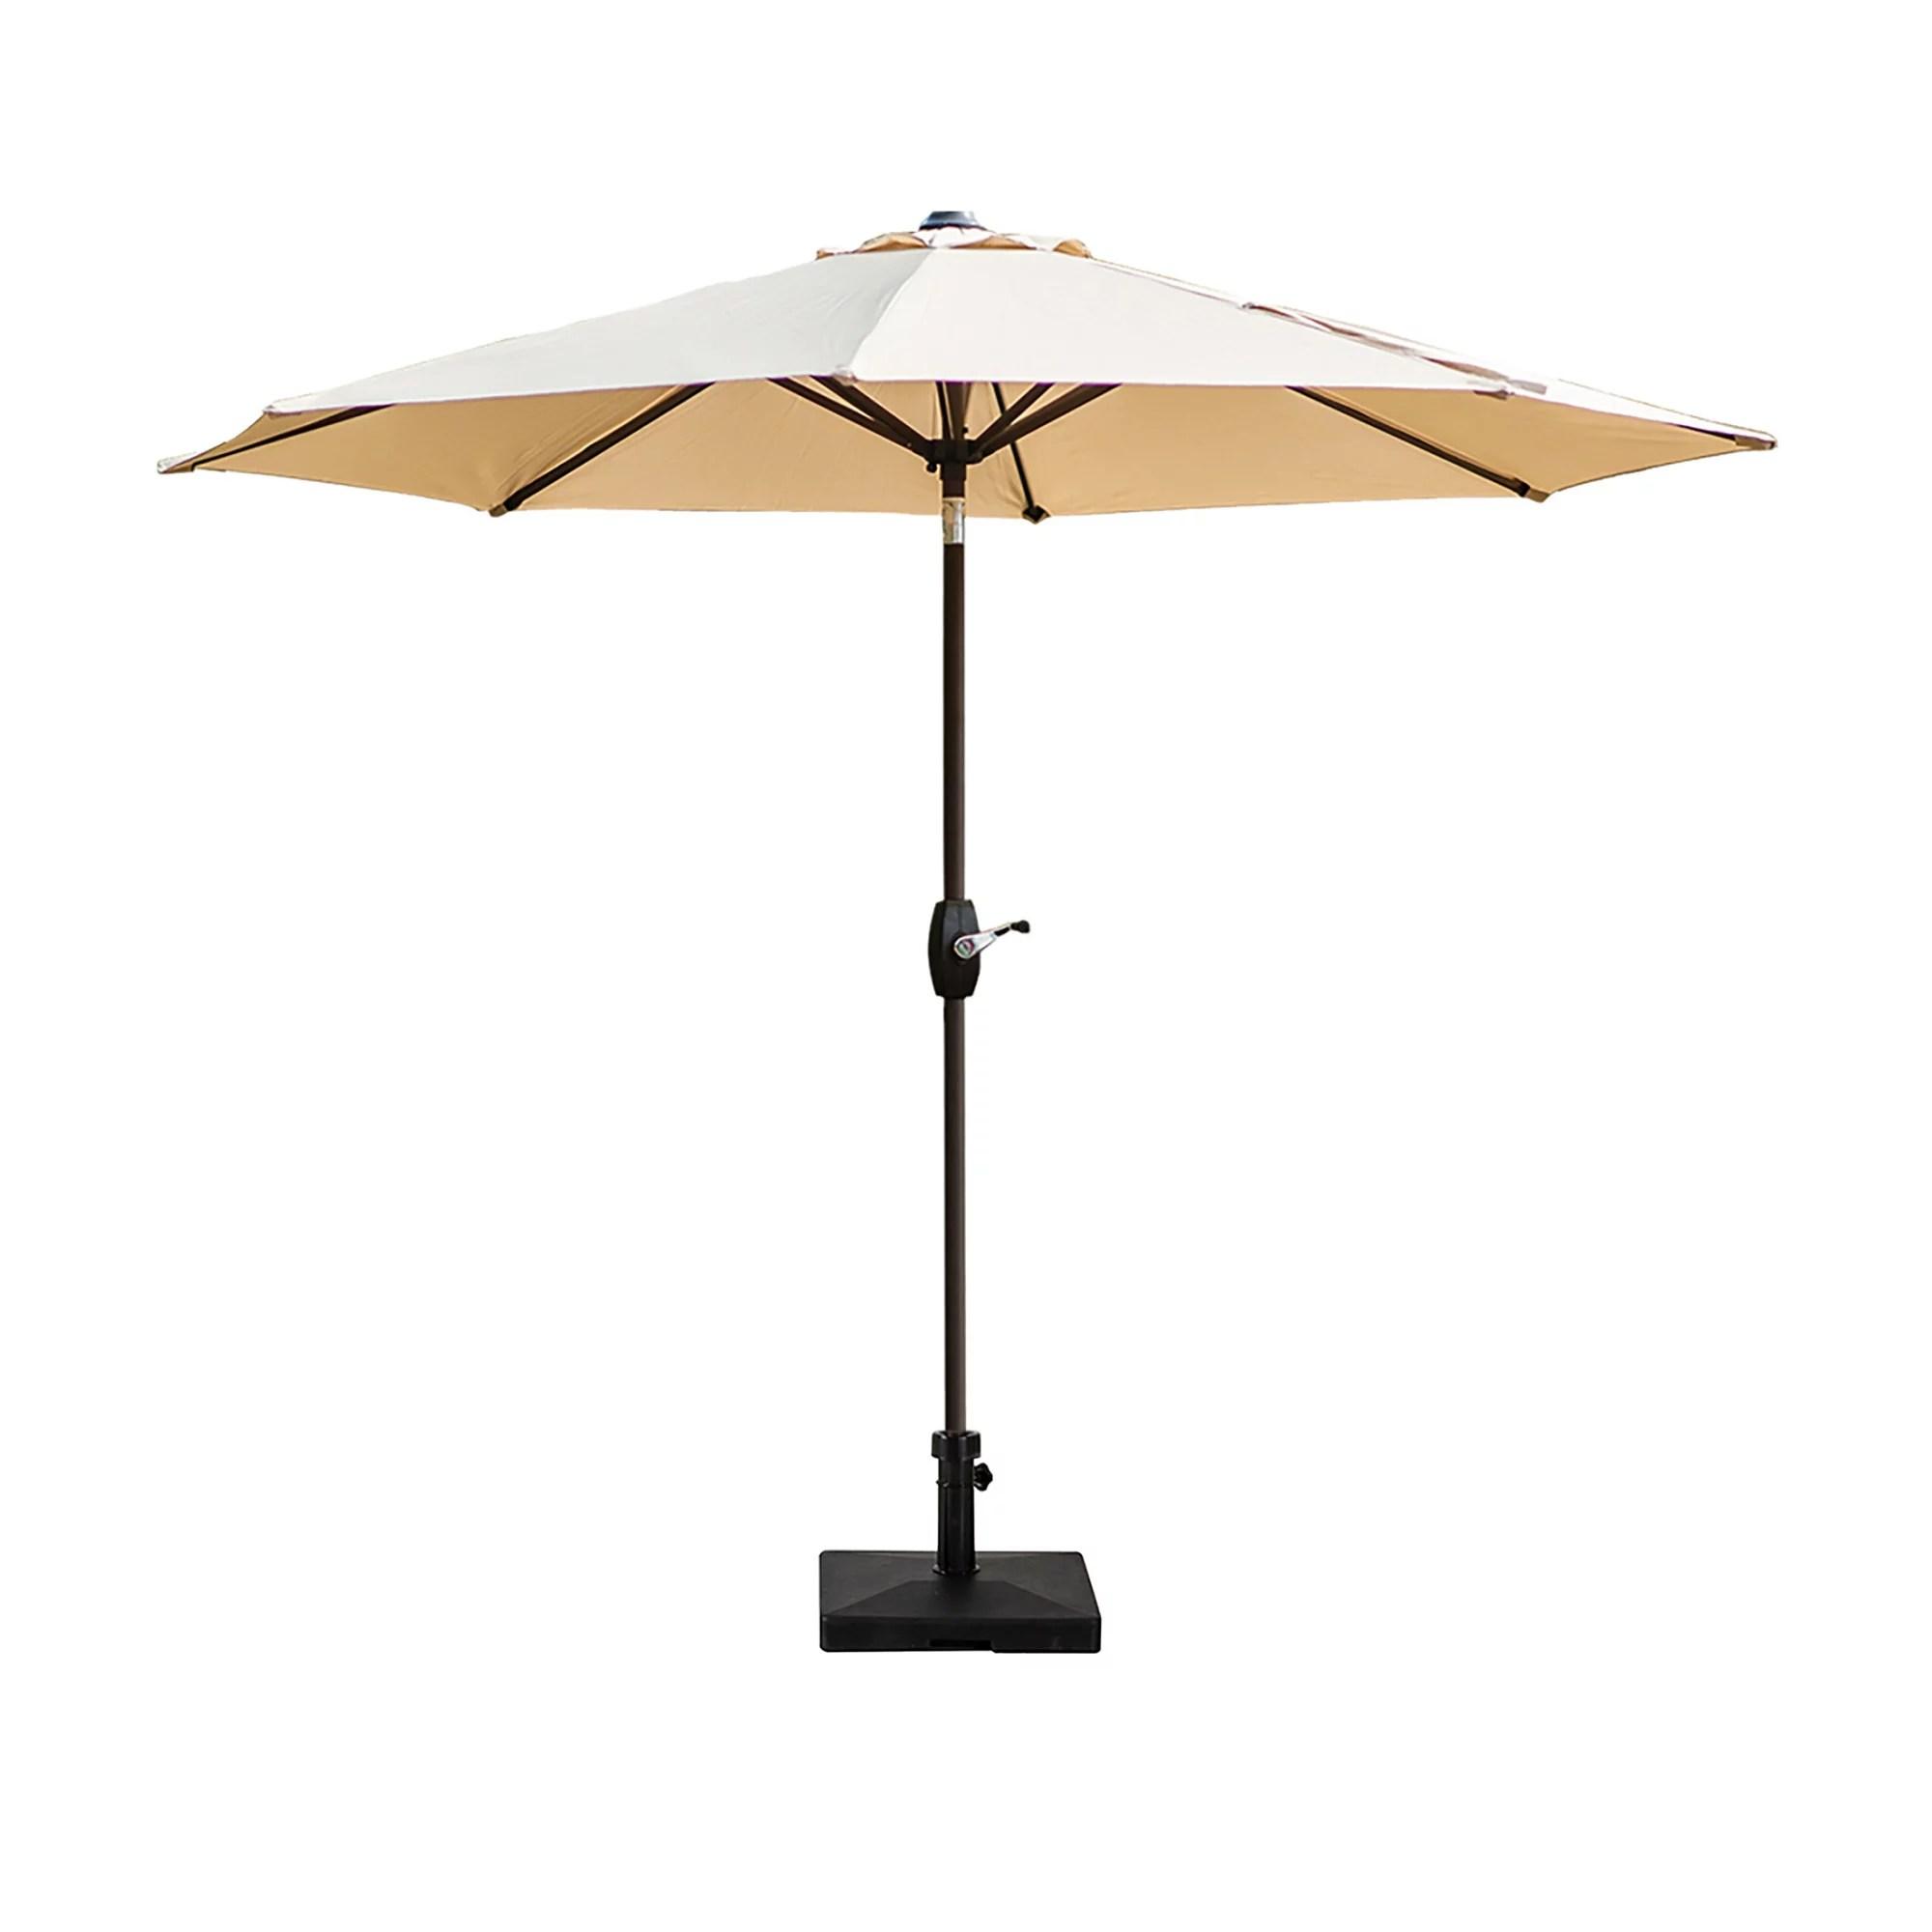 9 ft outdoor patio market table umbrella with square concrete base beige